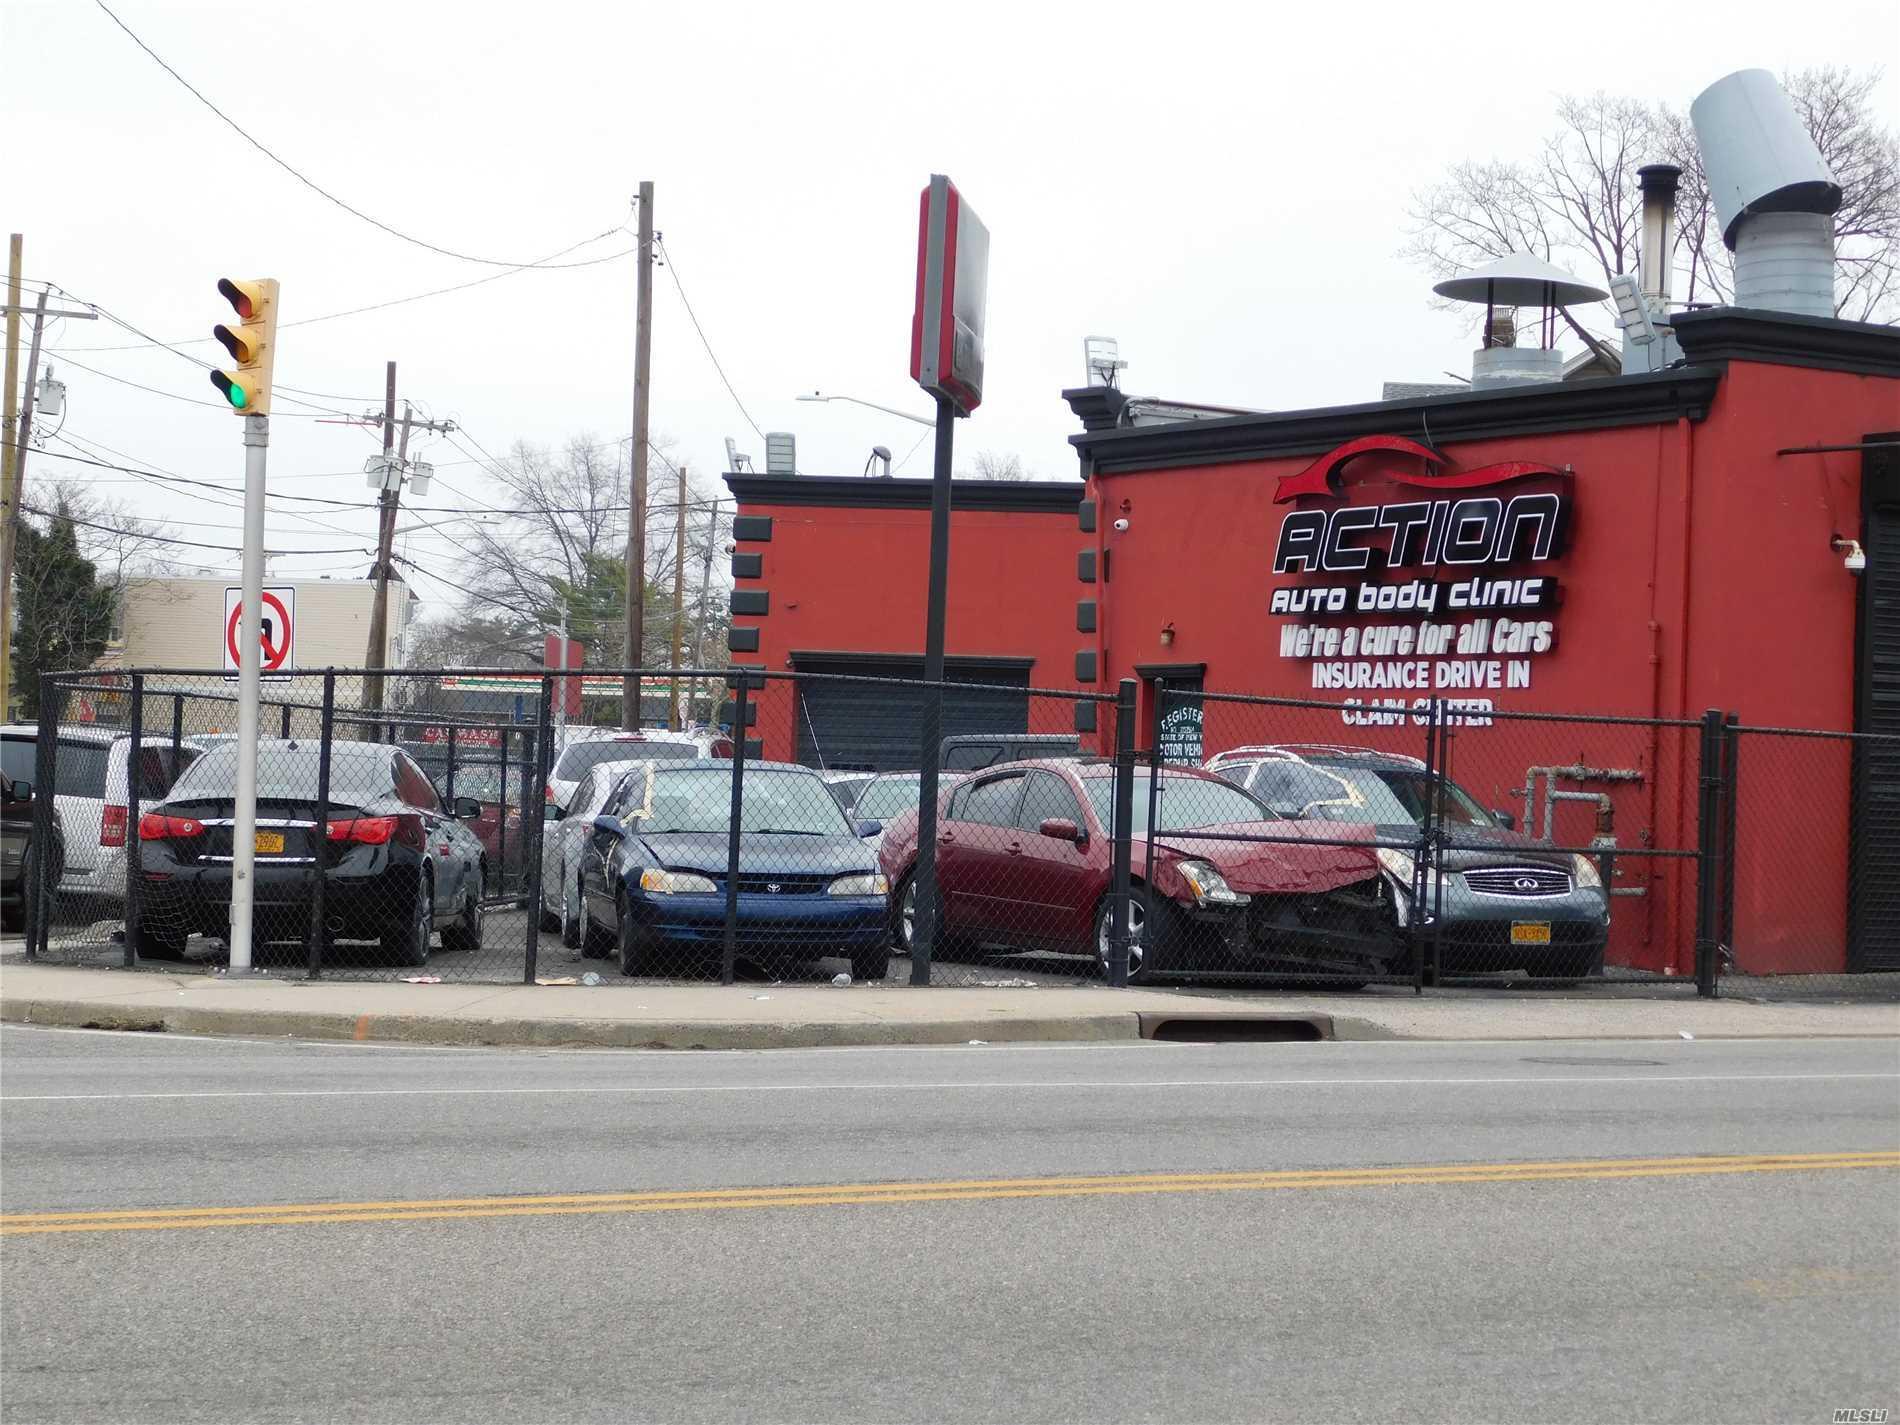 10 Jerusalem Ave - Hempstead, New York